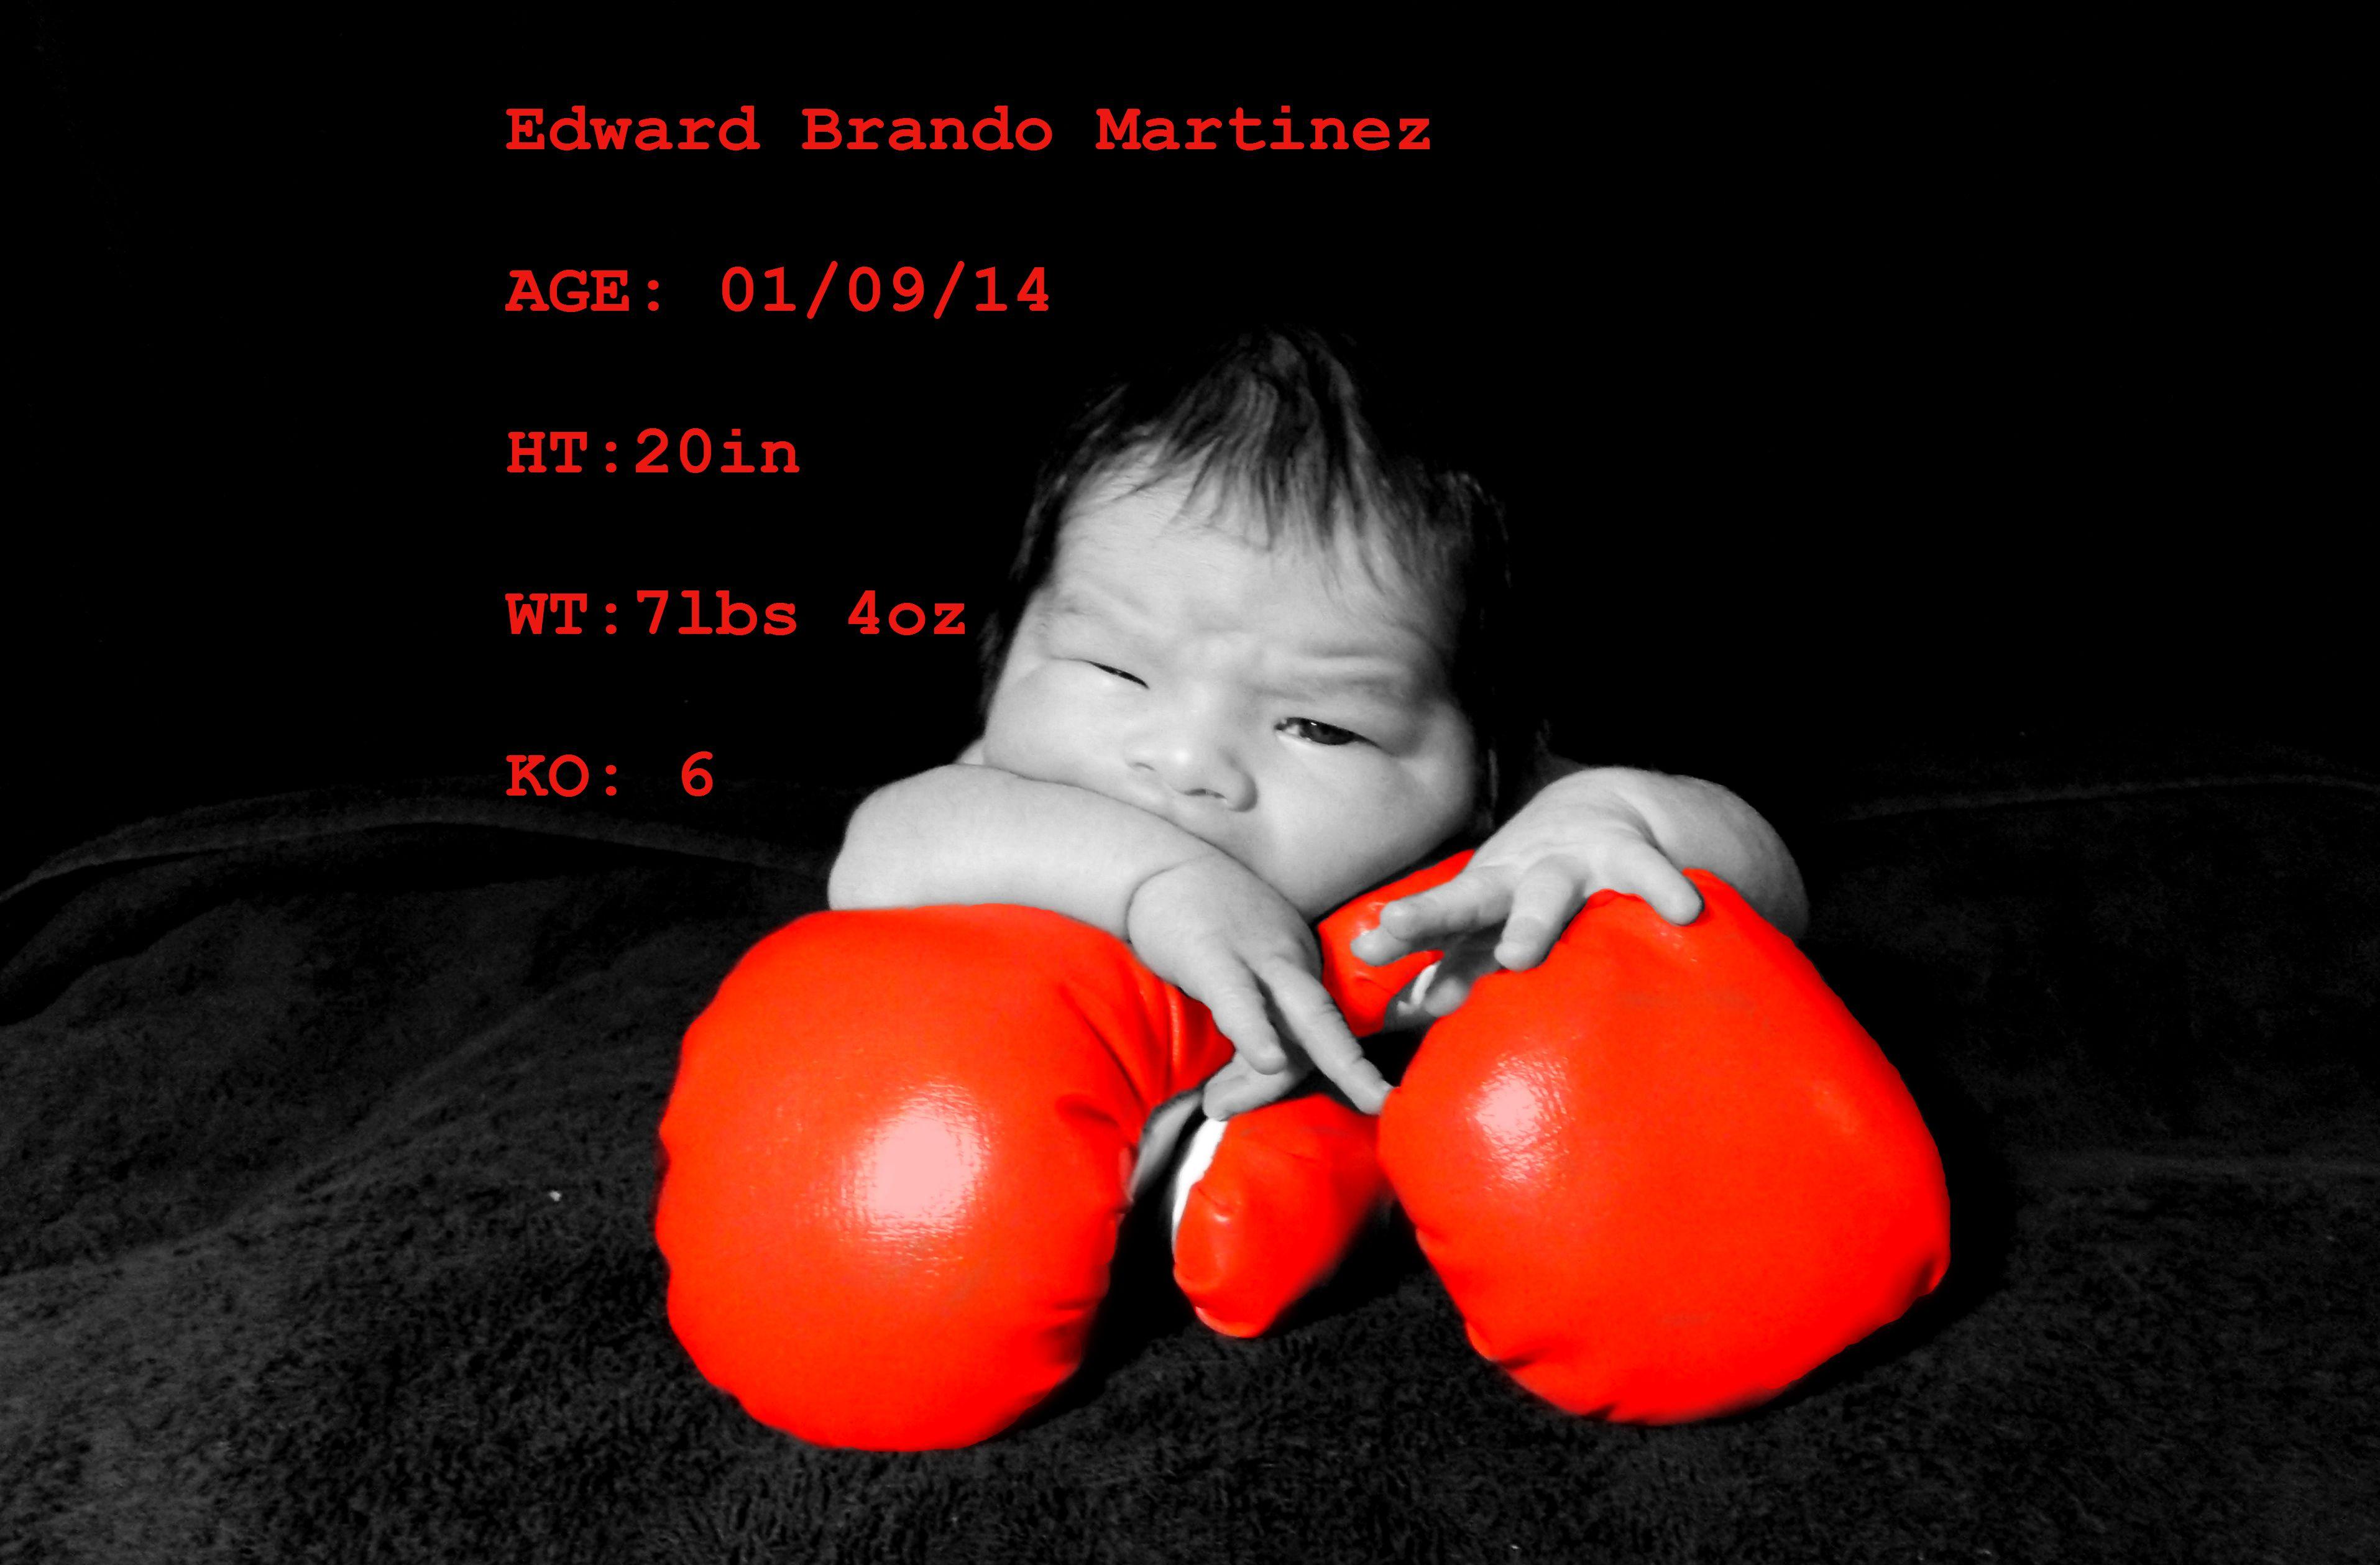 Edward Brando Martinez Birth Announcement #newborn #boxing #photography #newborn #boy #tough #edwardbrando